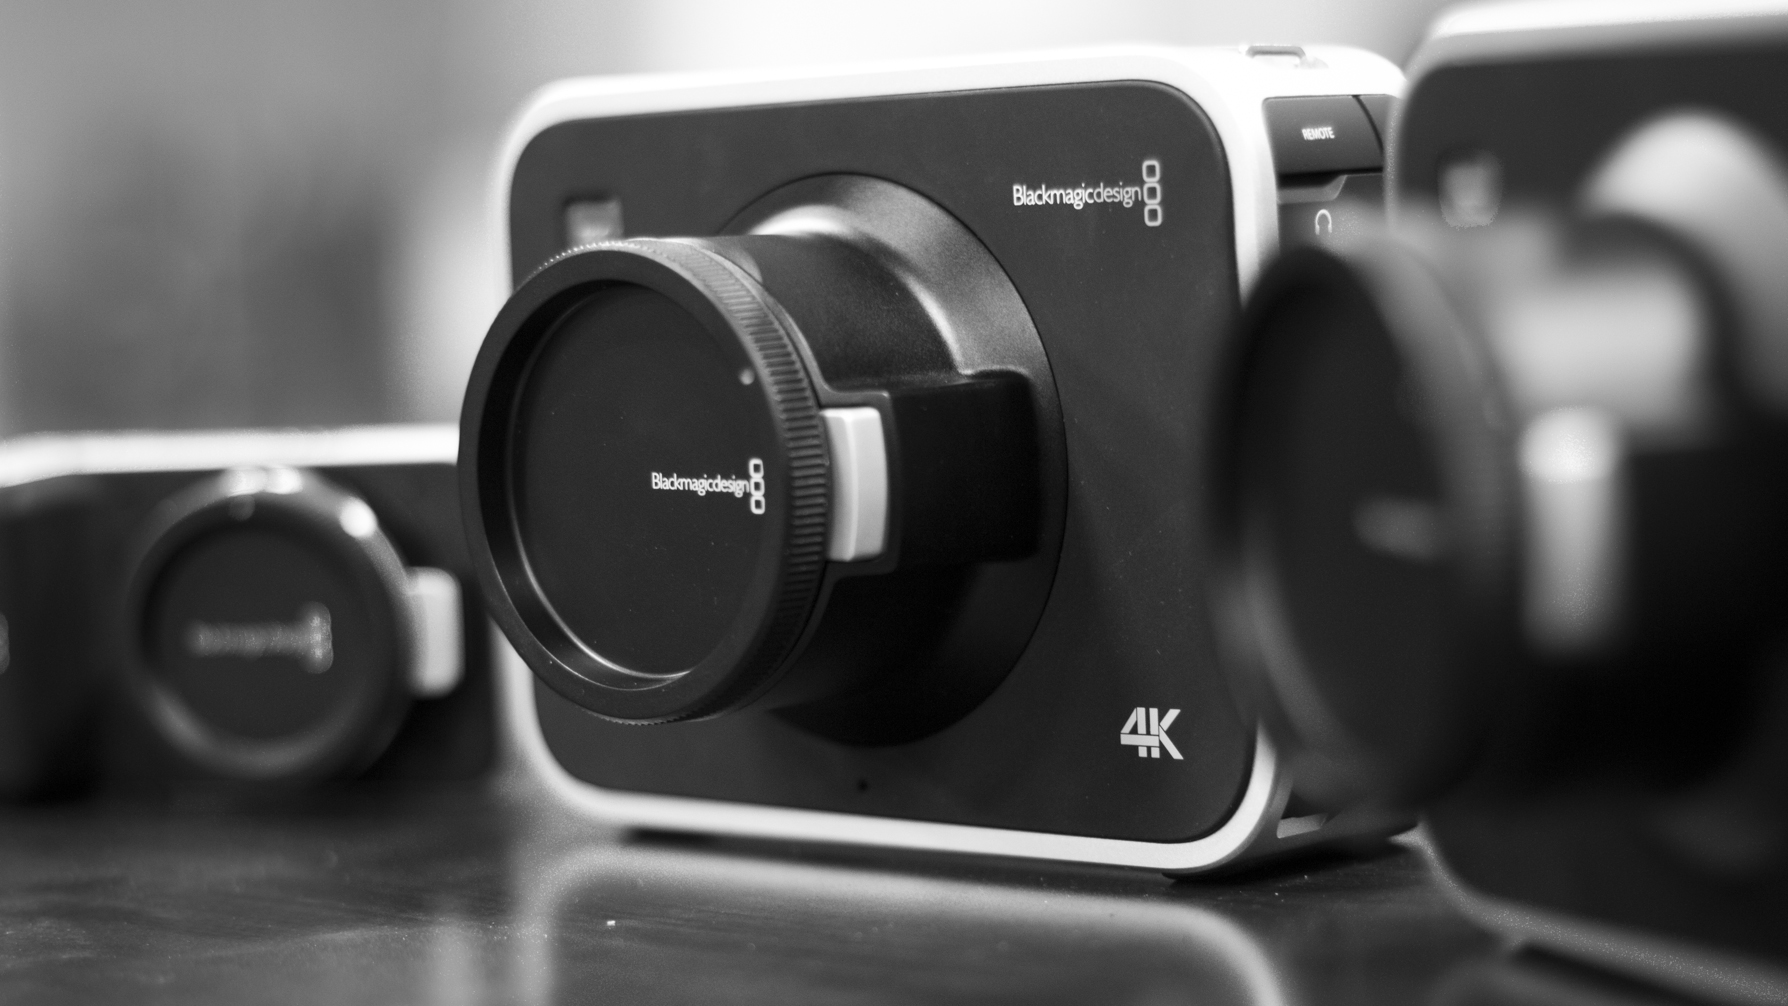 Blackmagic Releases Camera Firmware Updates 49